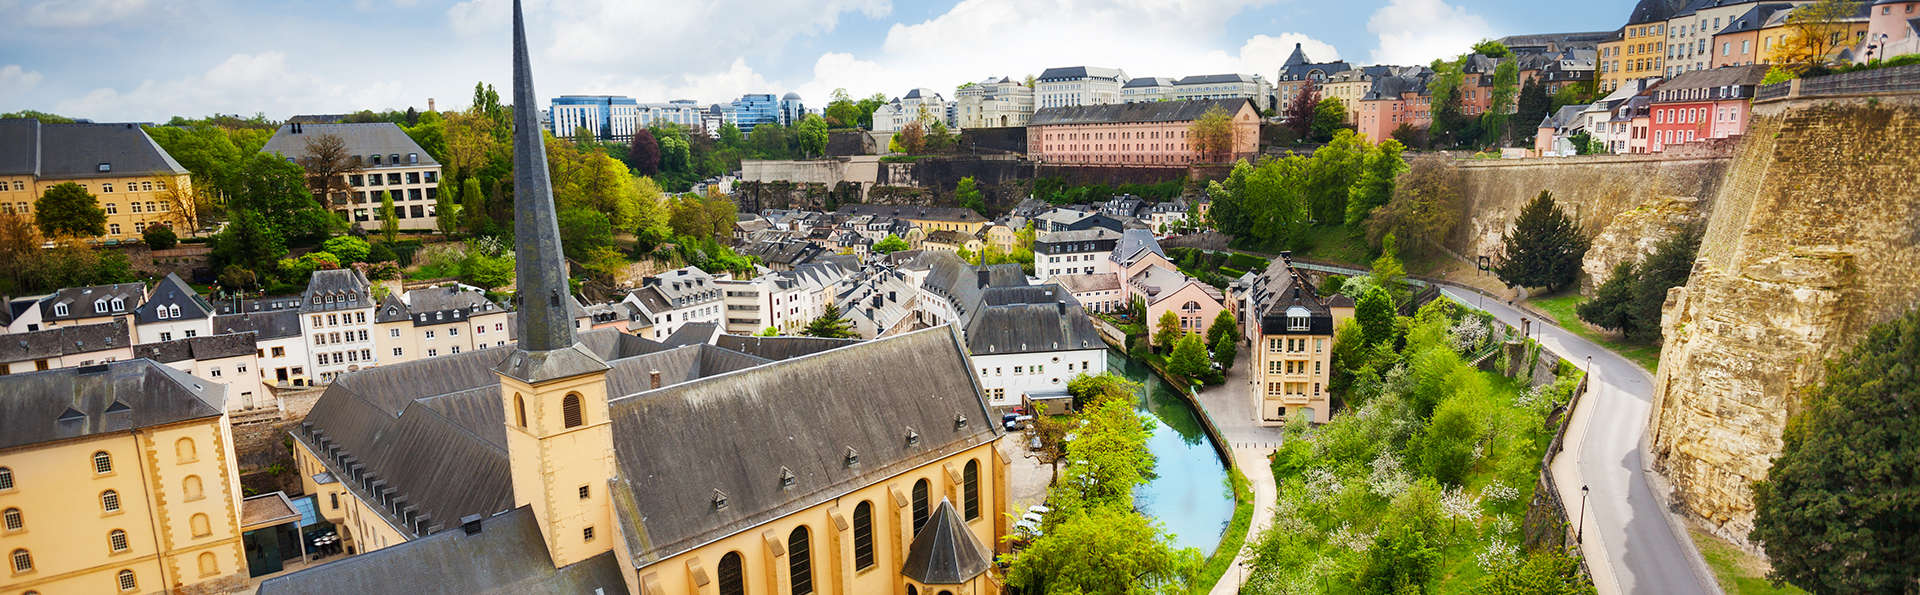 Dîner au coeur du Luxembourg